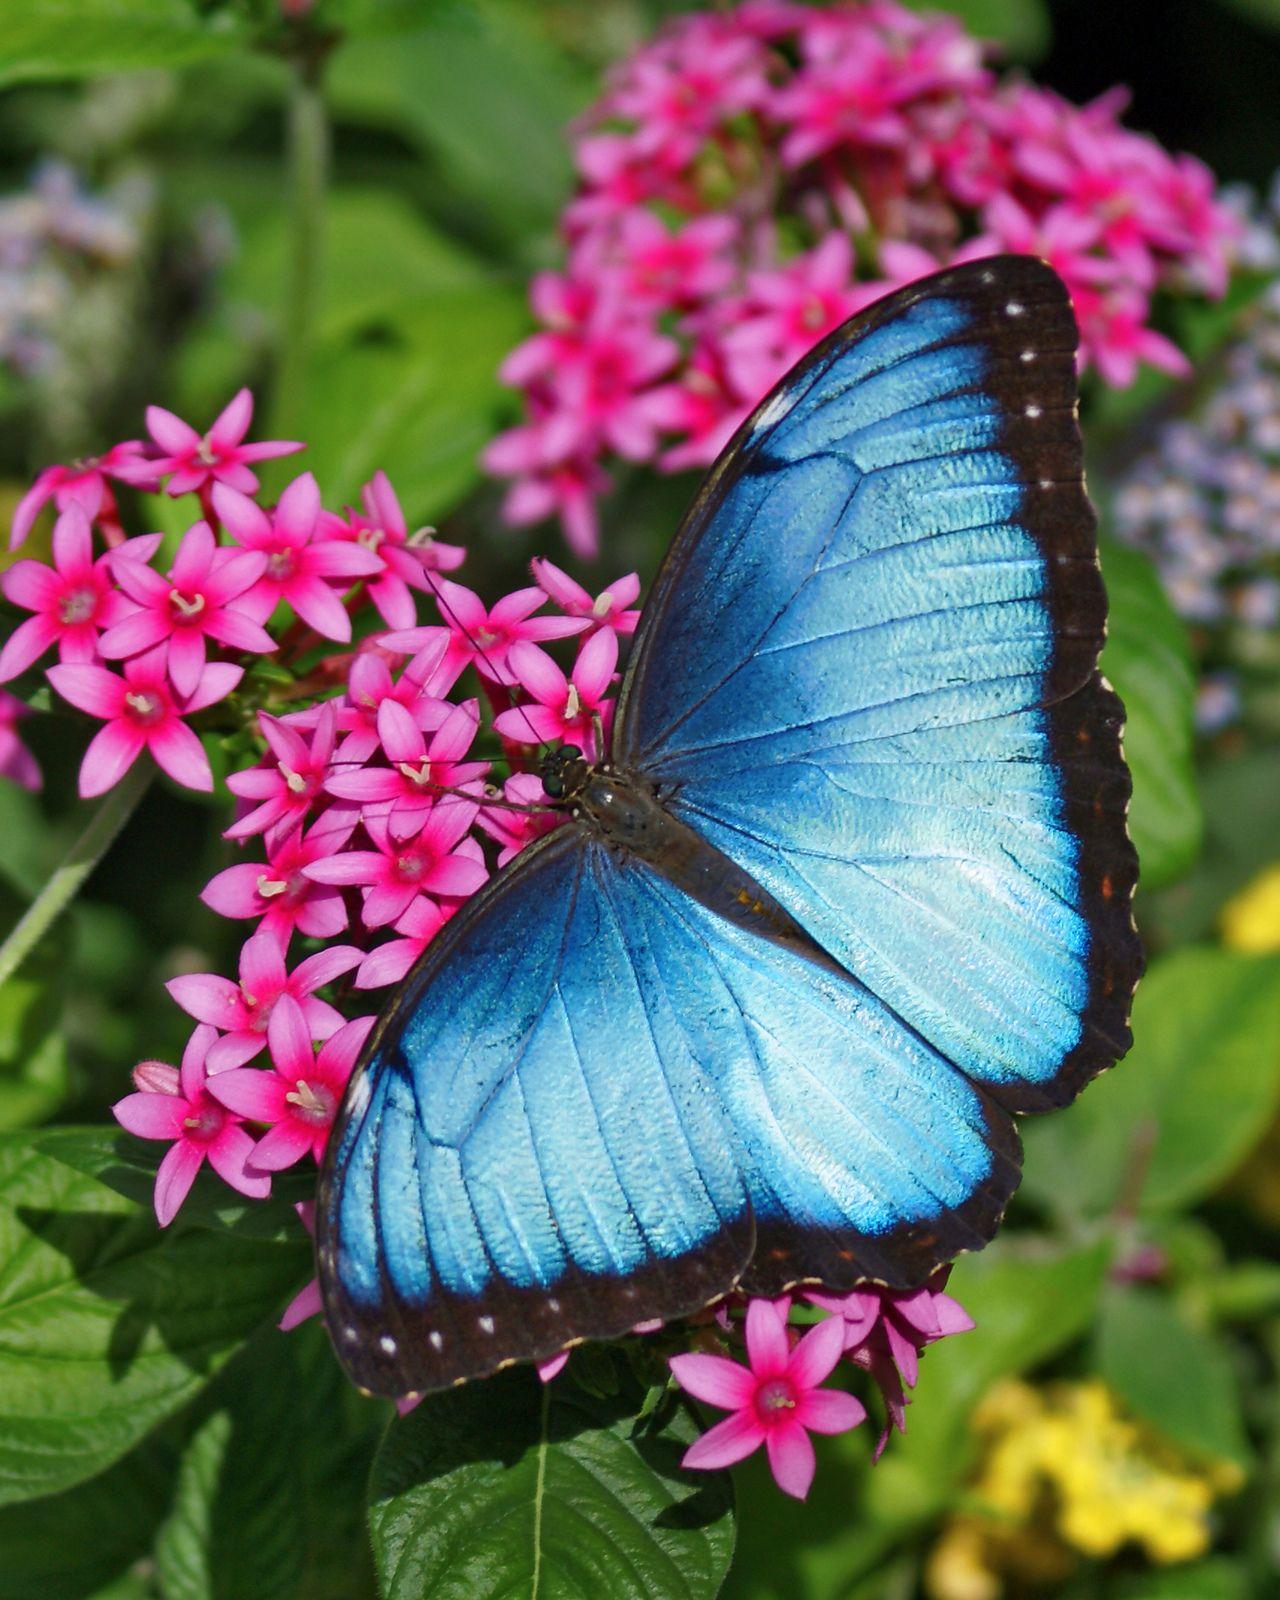 Astonishing blue morpho butterfly resting on flowers for Butterfly on flowers